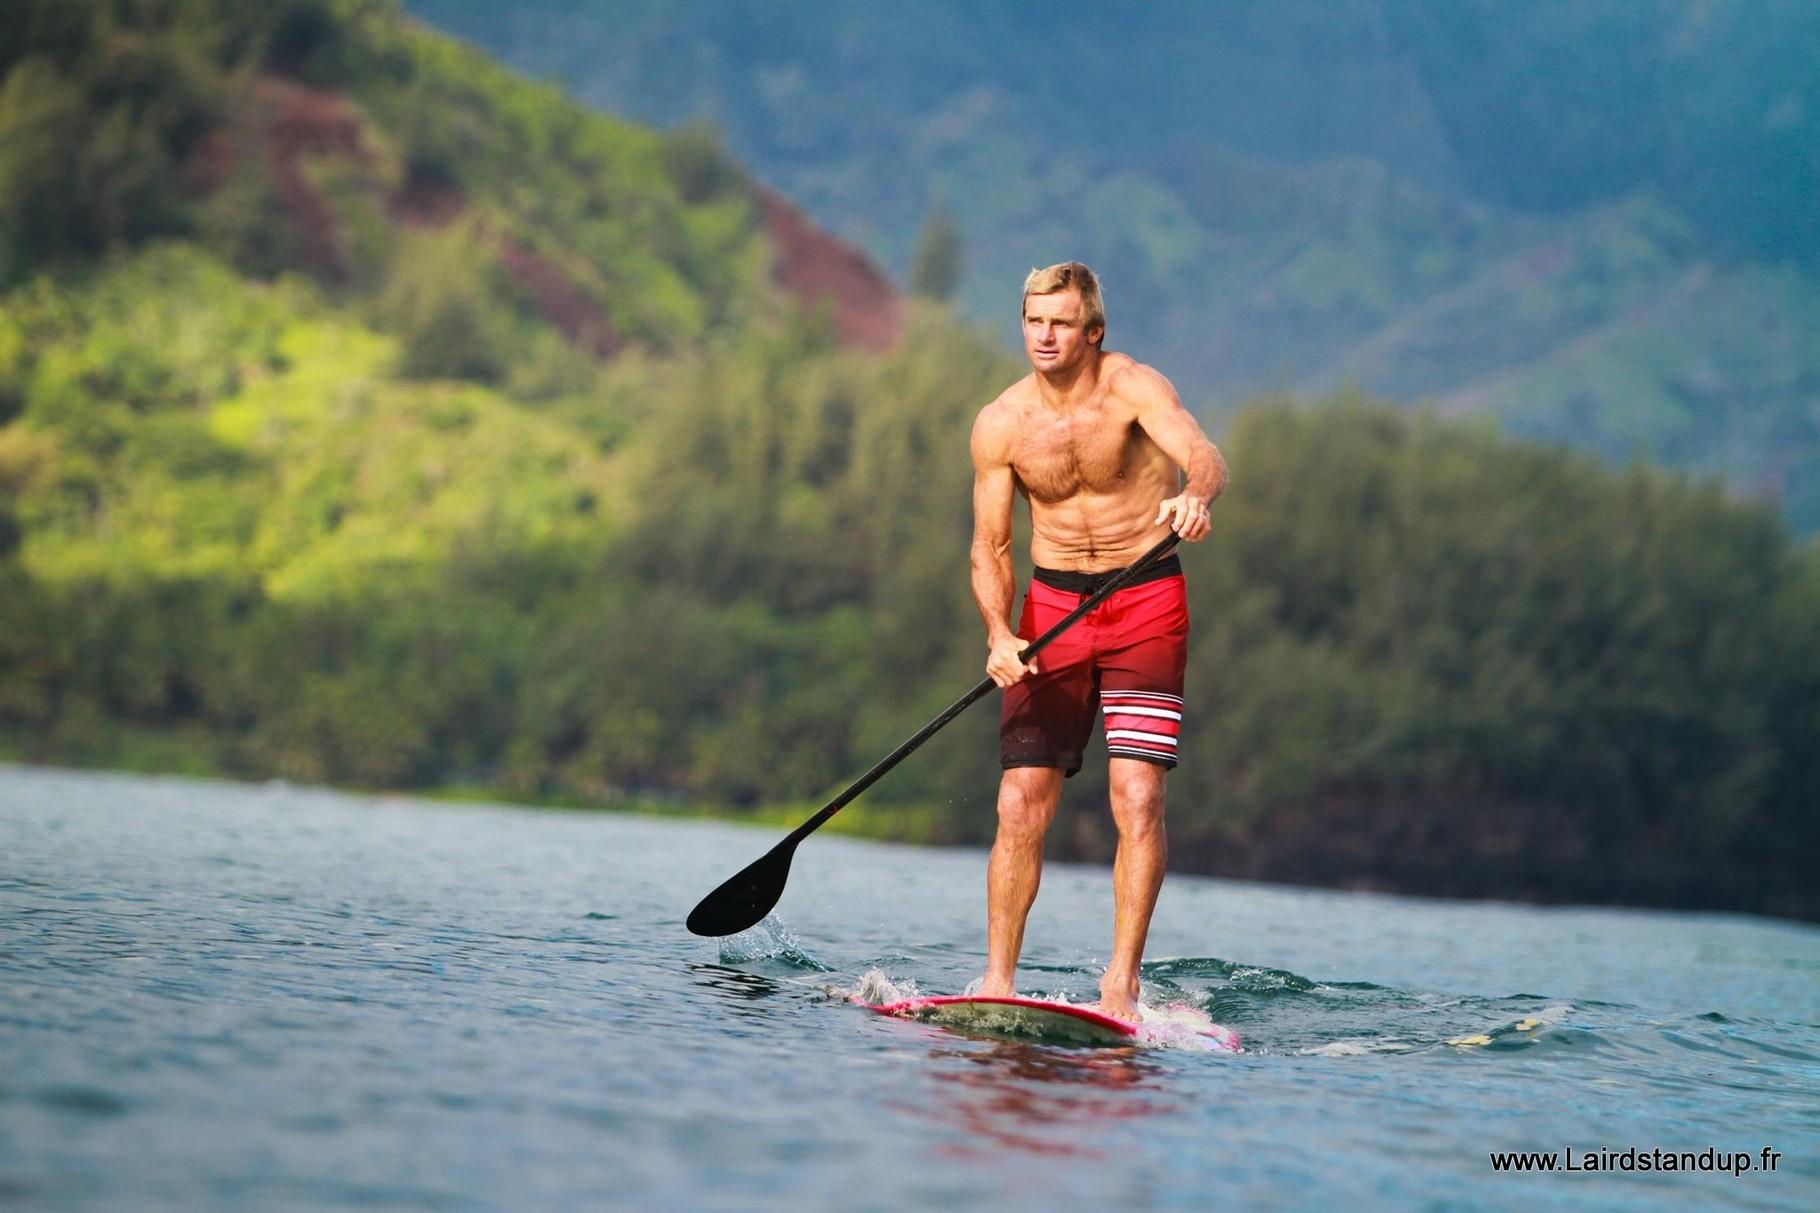 Laird Standup Paddle Son Choisir Sup N0wvn8m